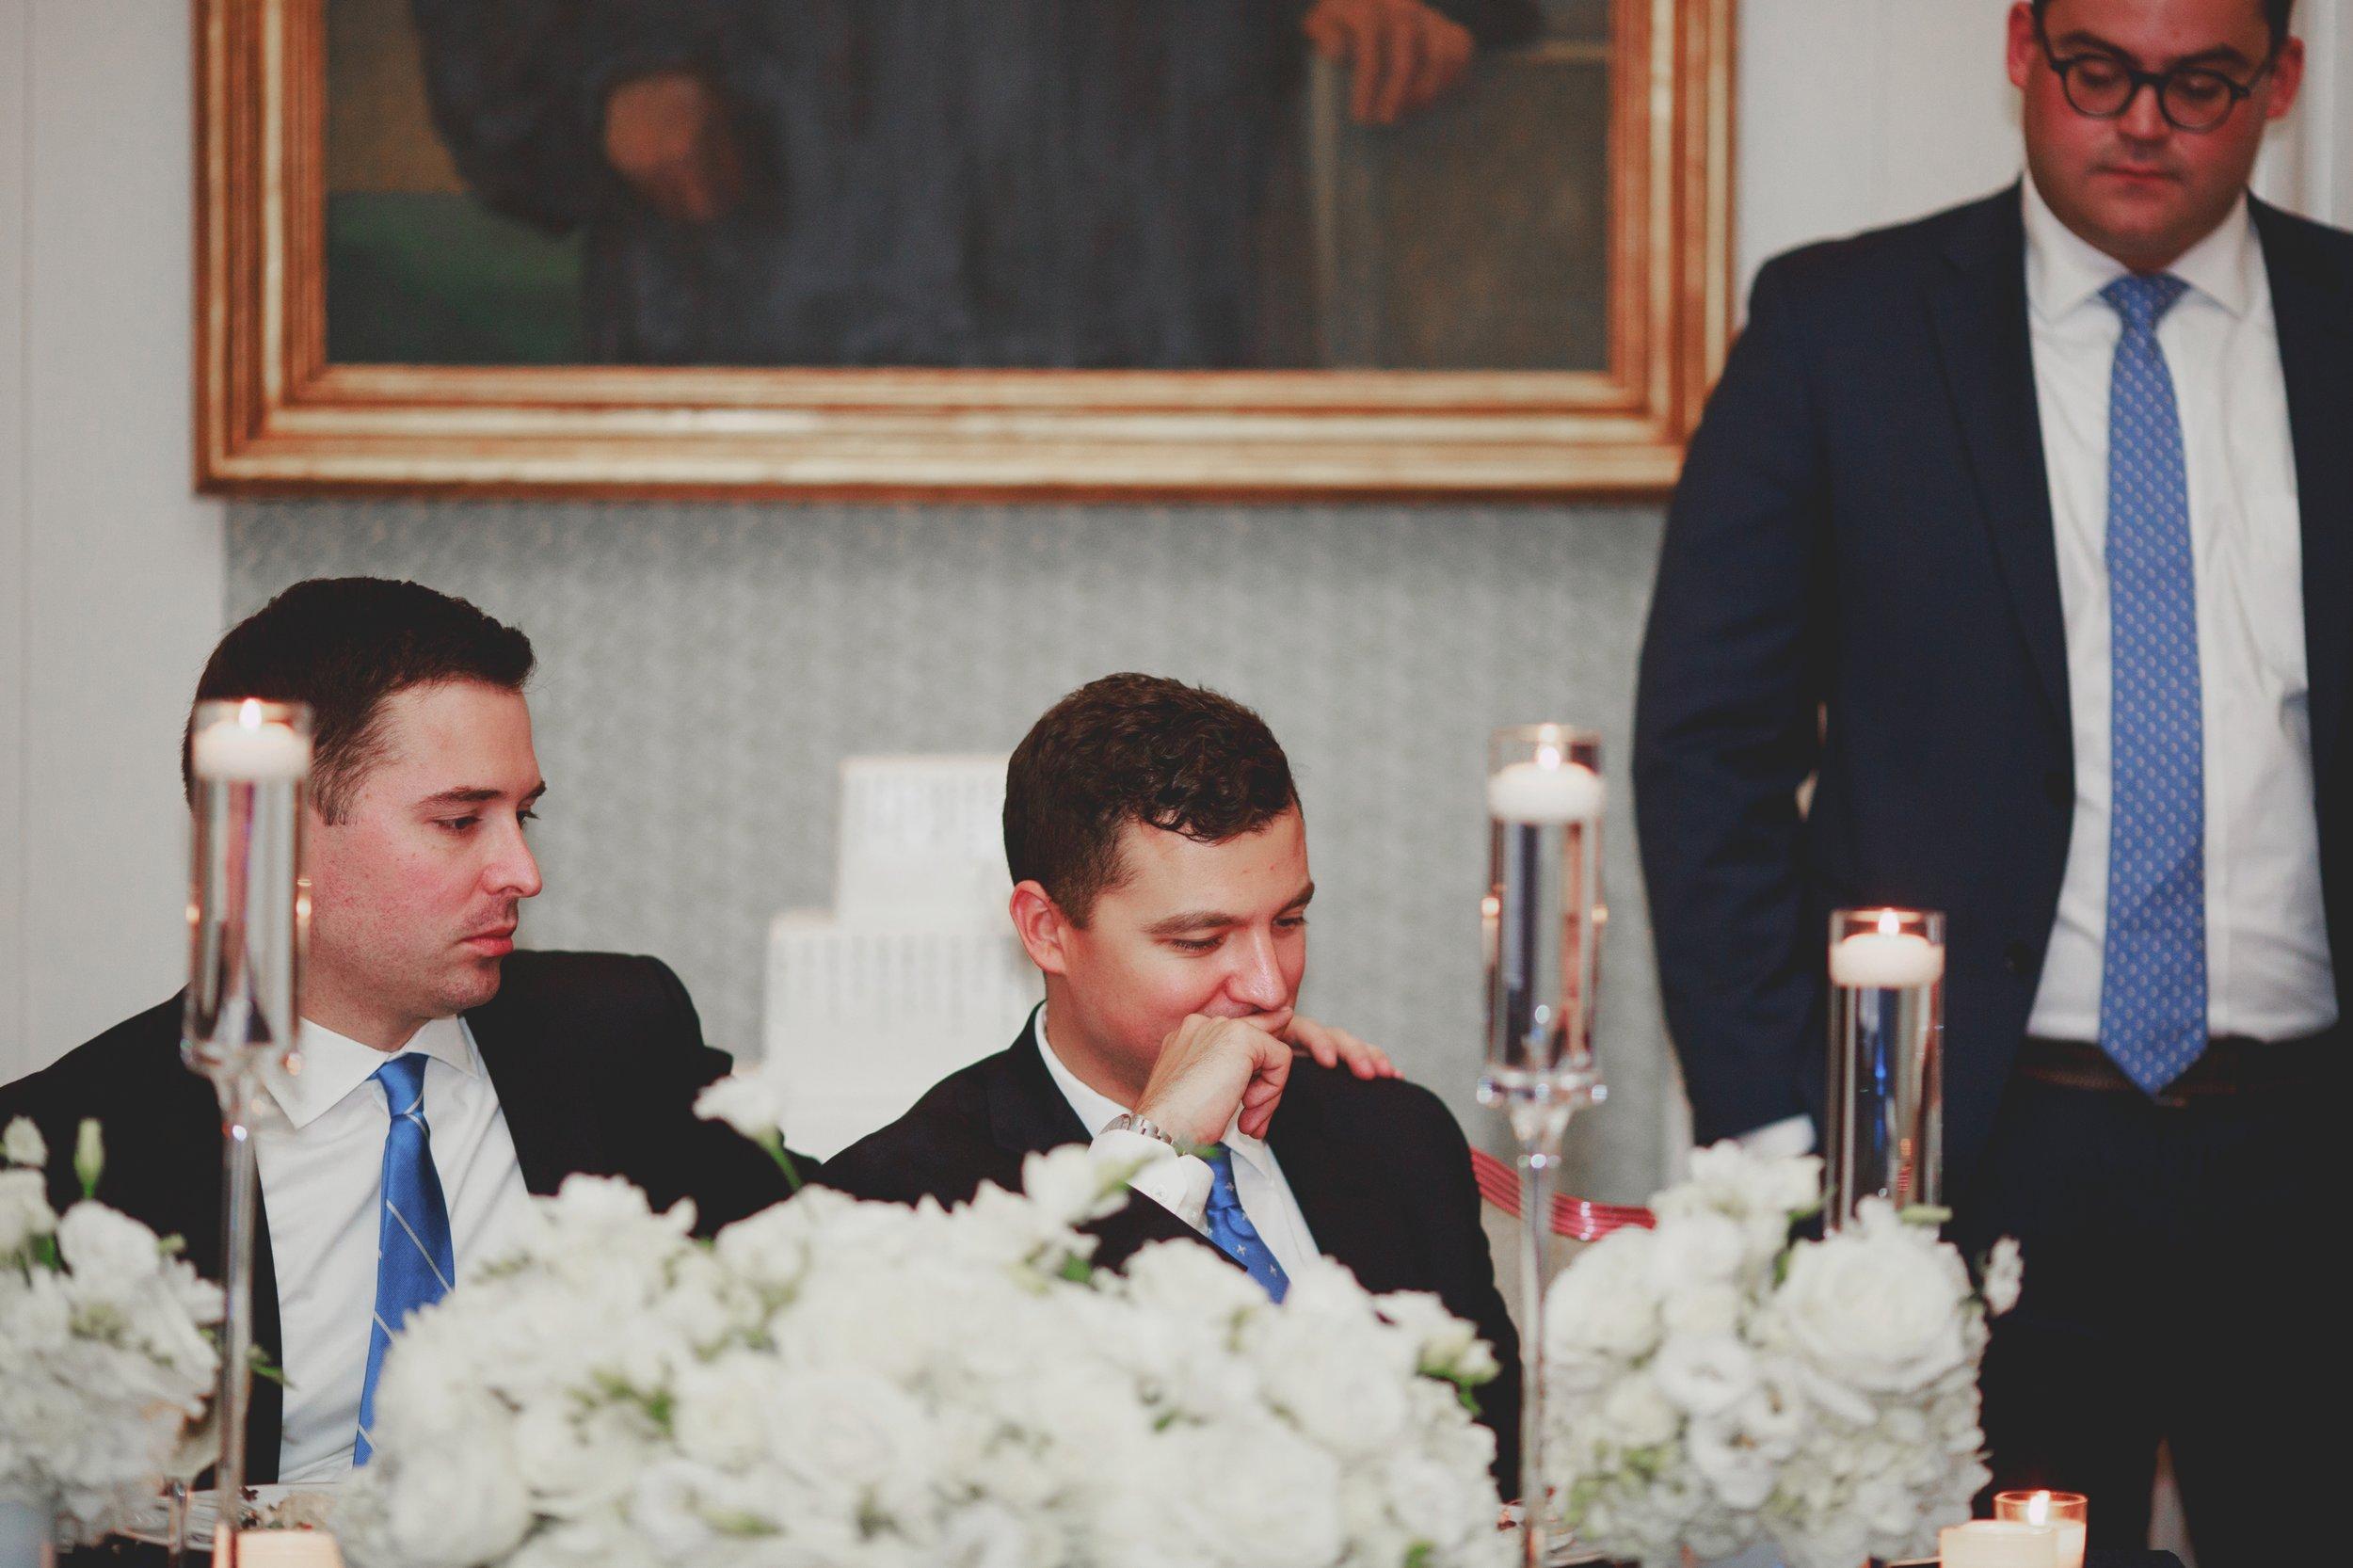 amanda_vanvels_new_york_lgbtq_gay_wedding_098.jpg